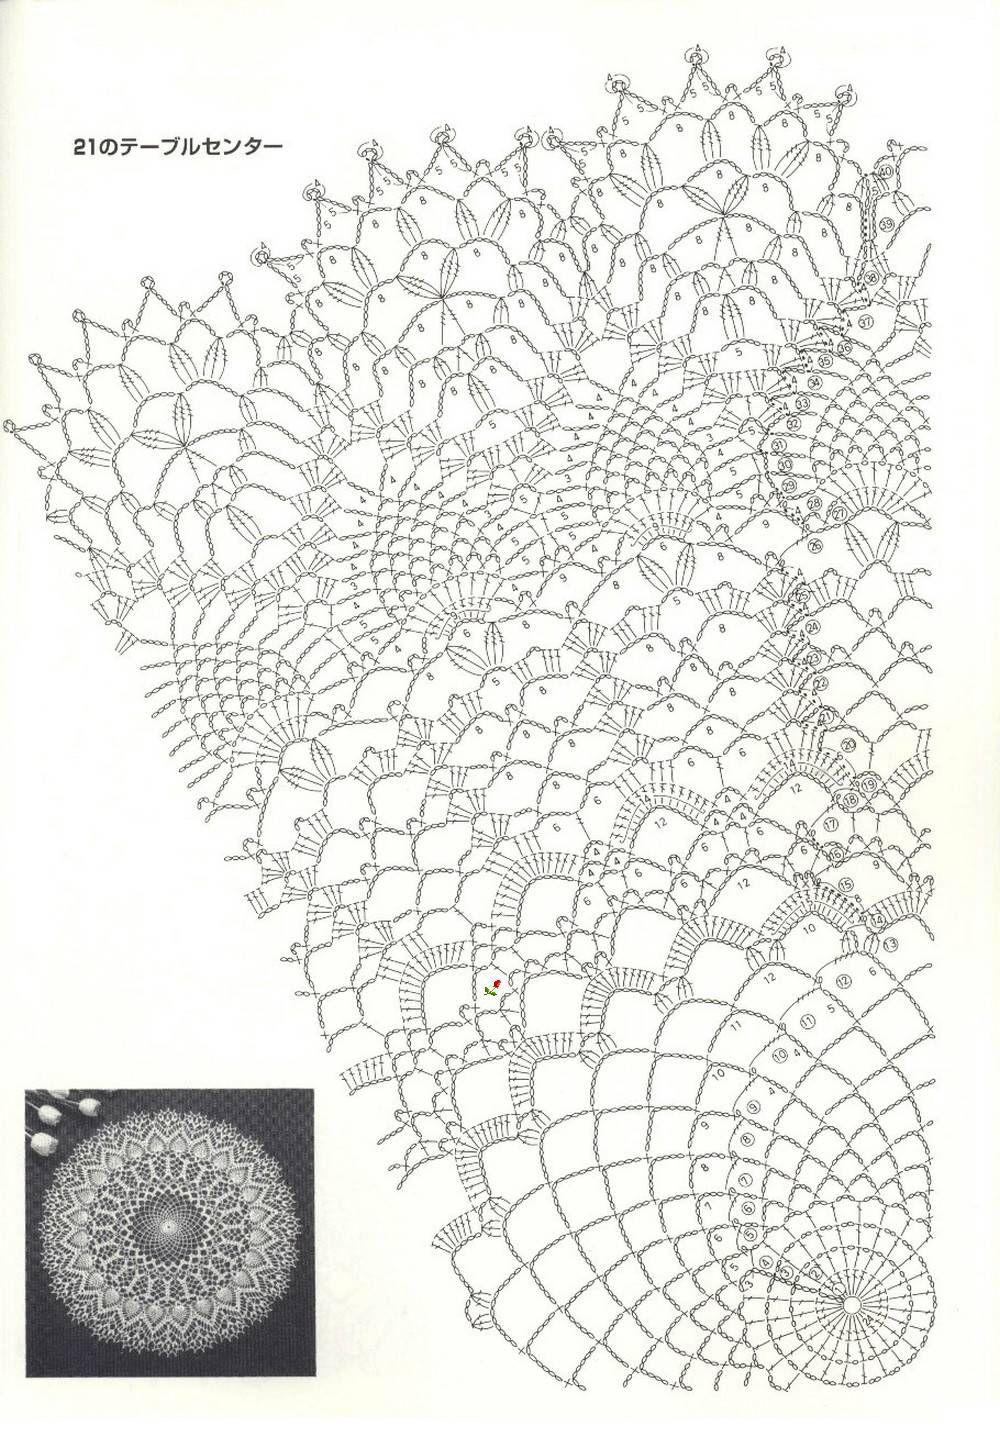 Pin by RieQa on Doilies | Pinterest | Crochet, Crochet doilies and ...